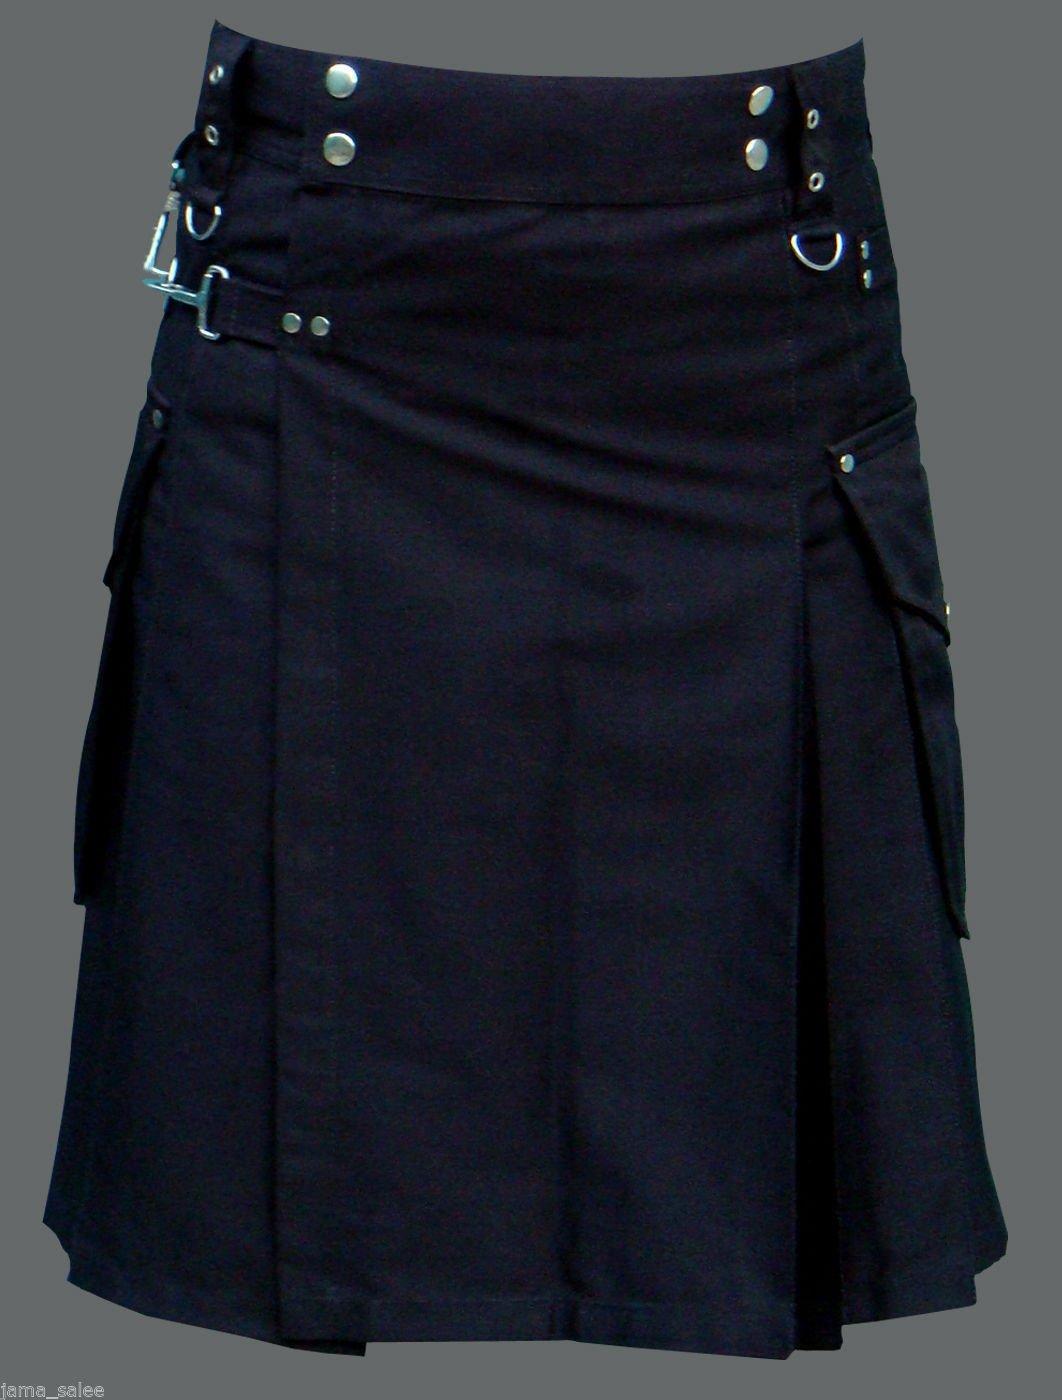 Men 60 Waist Handmade Black Deluxe Utility Kilt 100% Cotton With Cargo Pockets